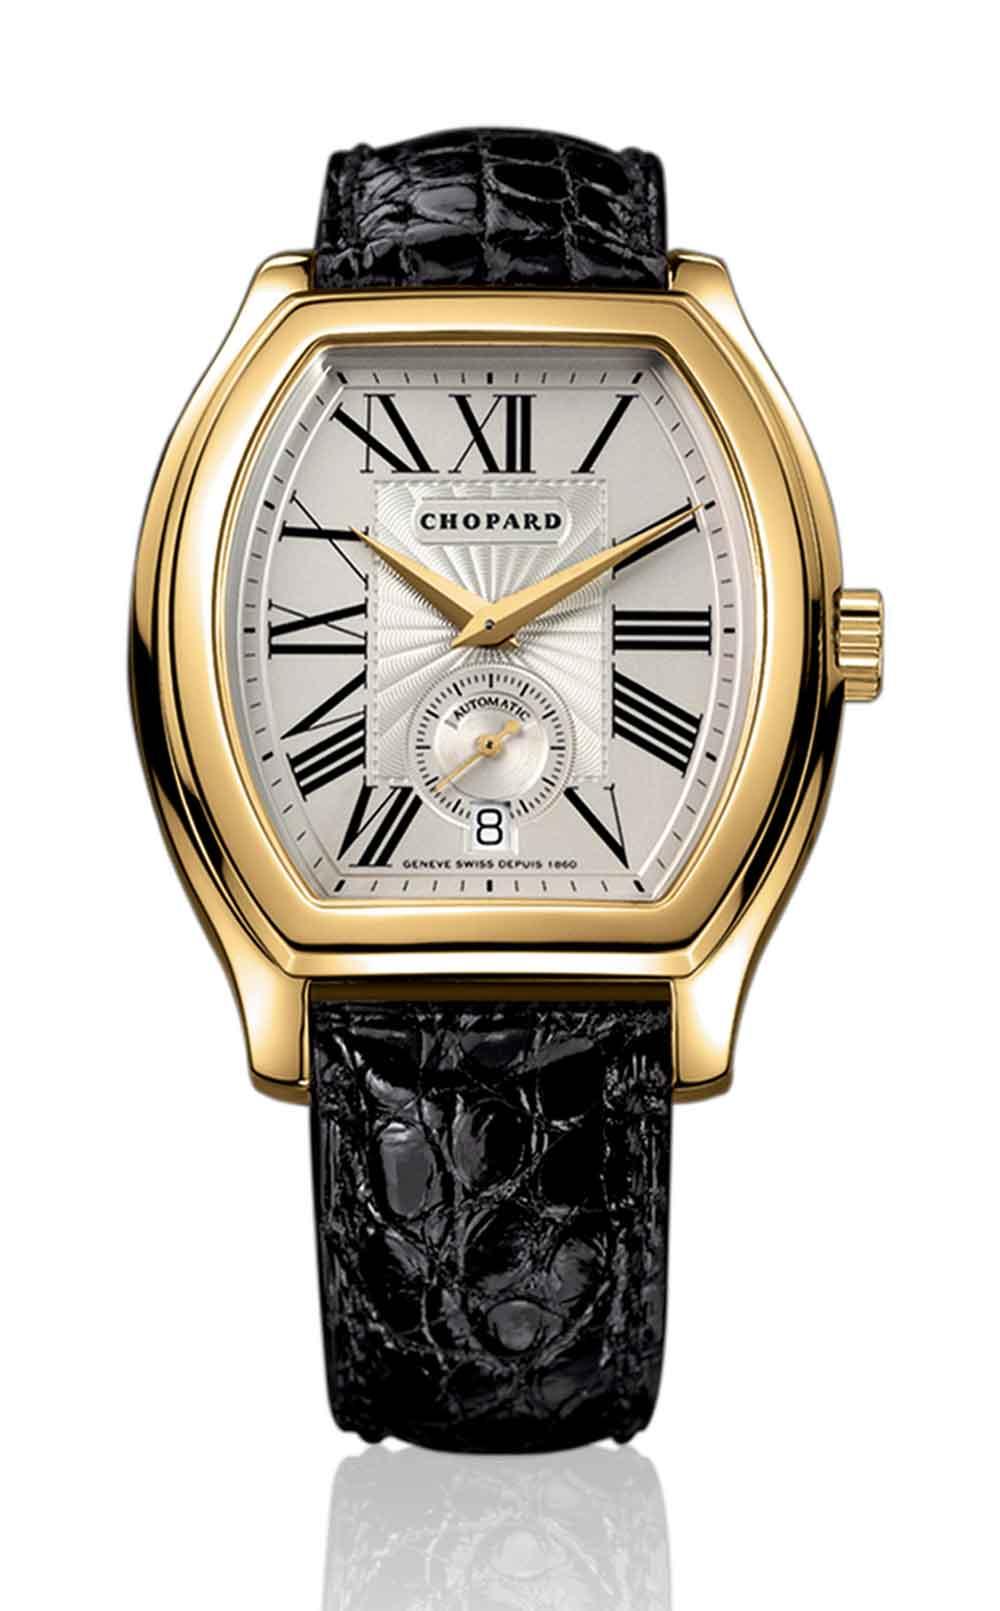 Reloj L.U.C Tonneau de Chopard de 2001